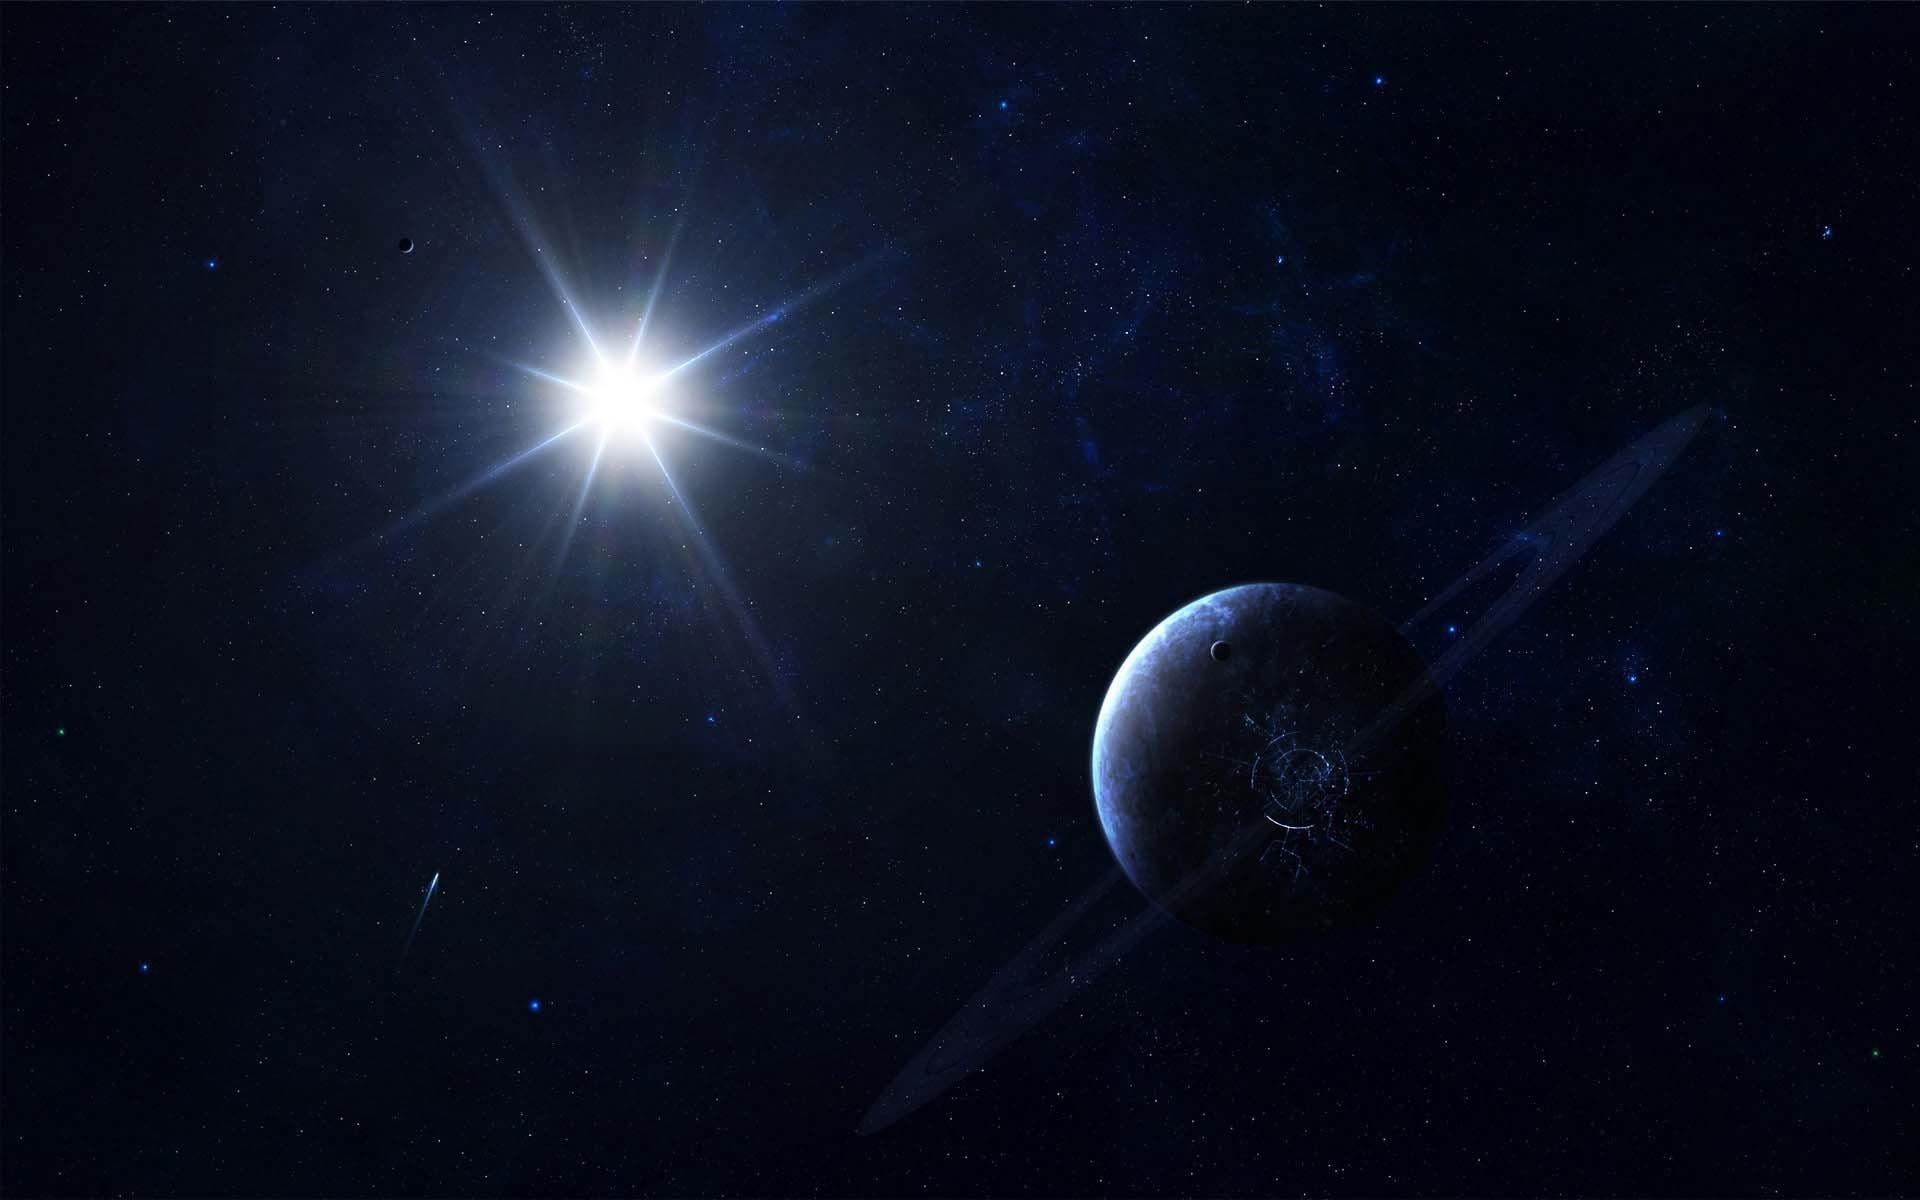 Shining Star Wallpaper (57+ images)